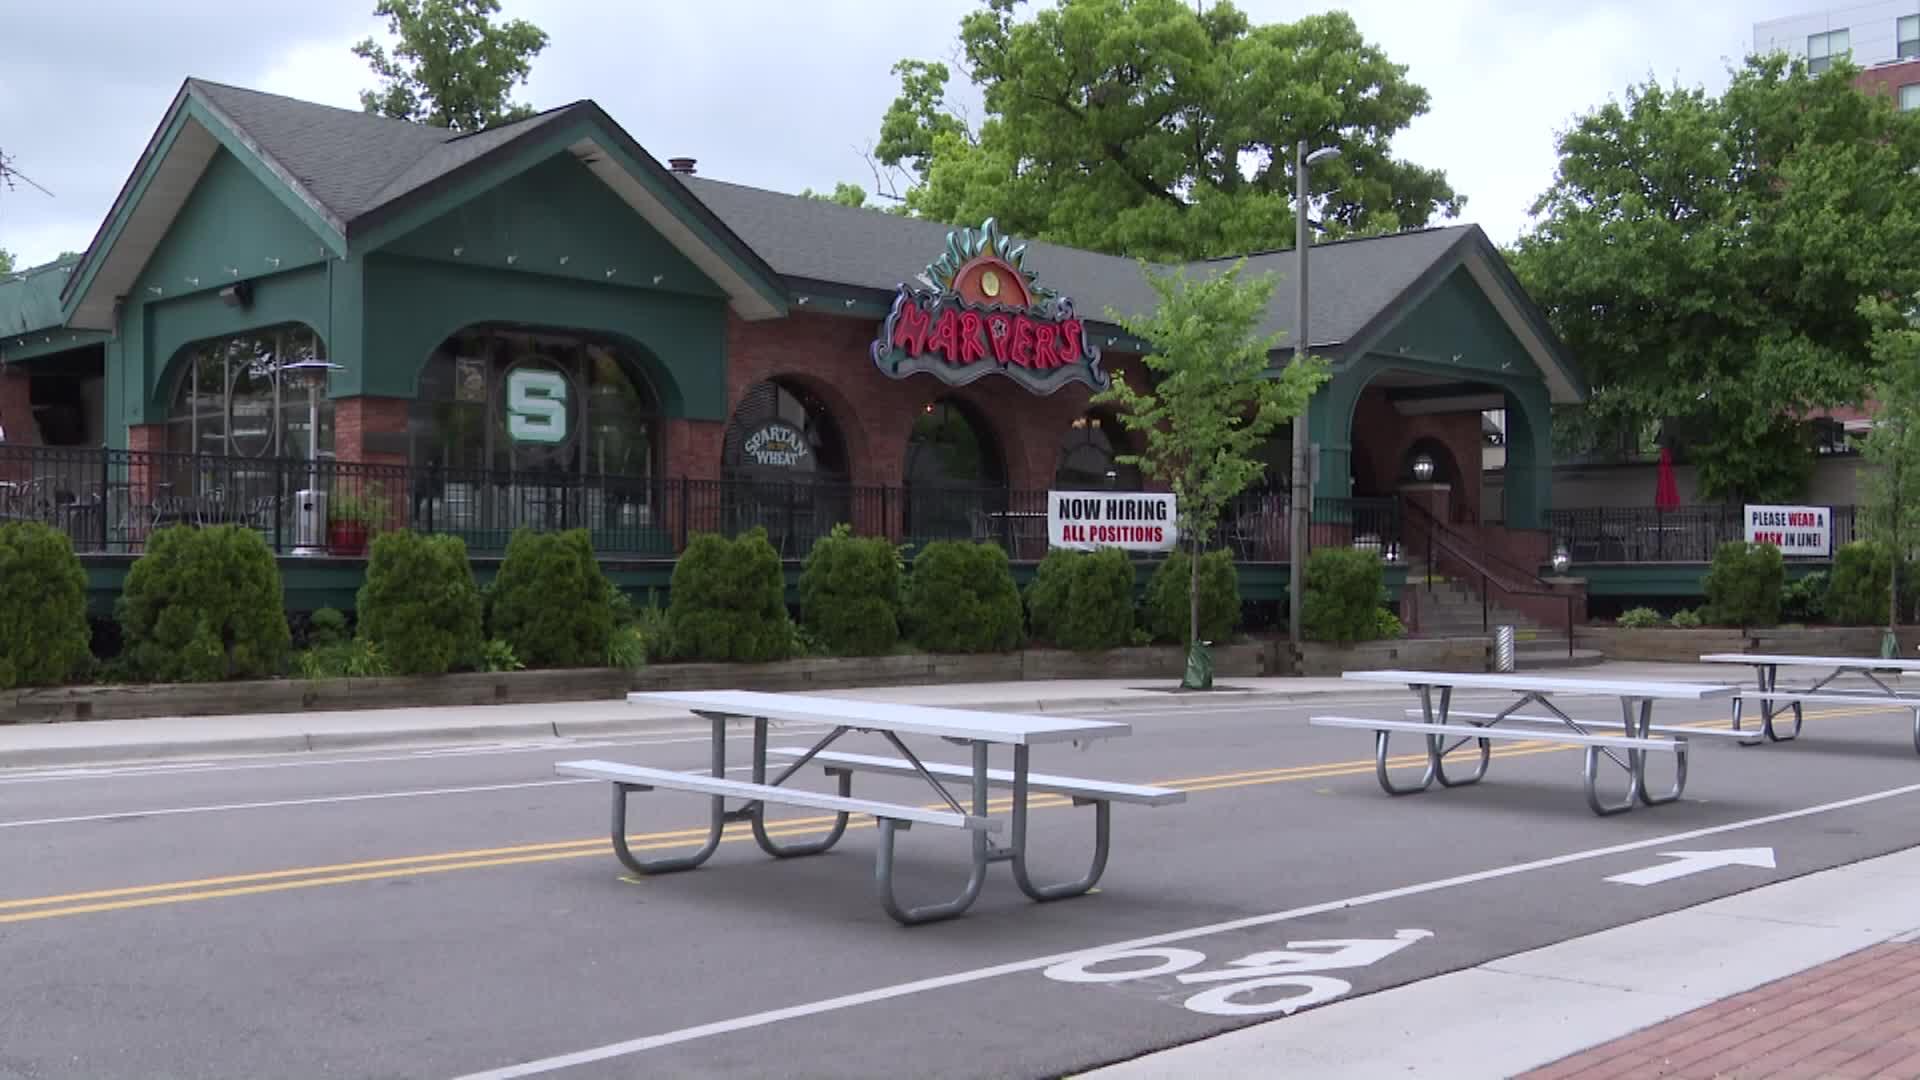 Harper's Restaurant & Brew Pub in East Lansing, Michigan.